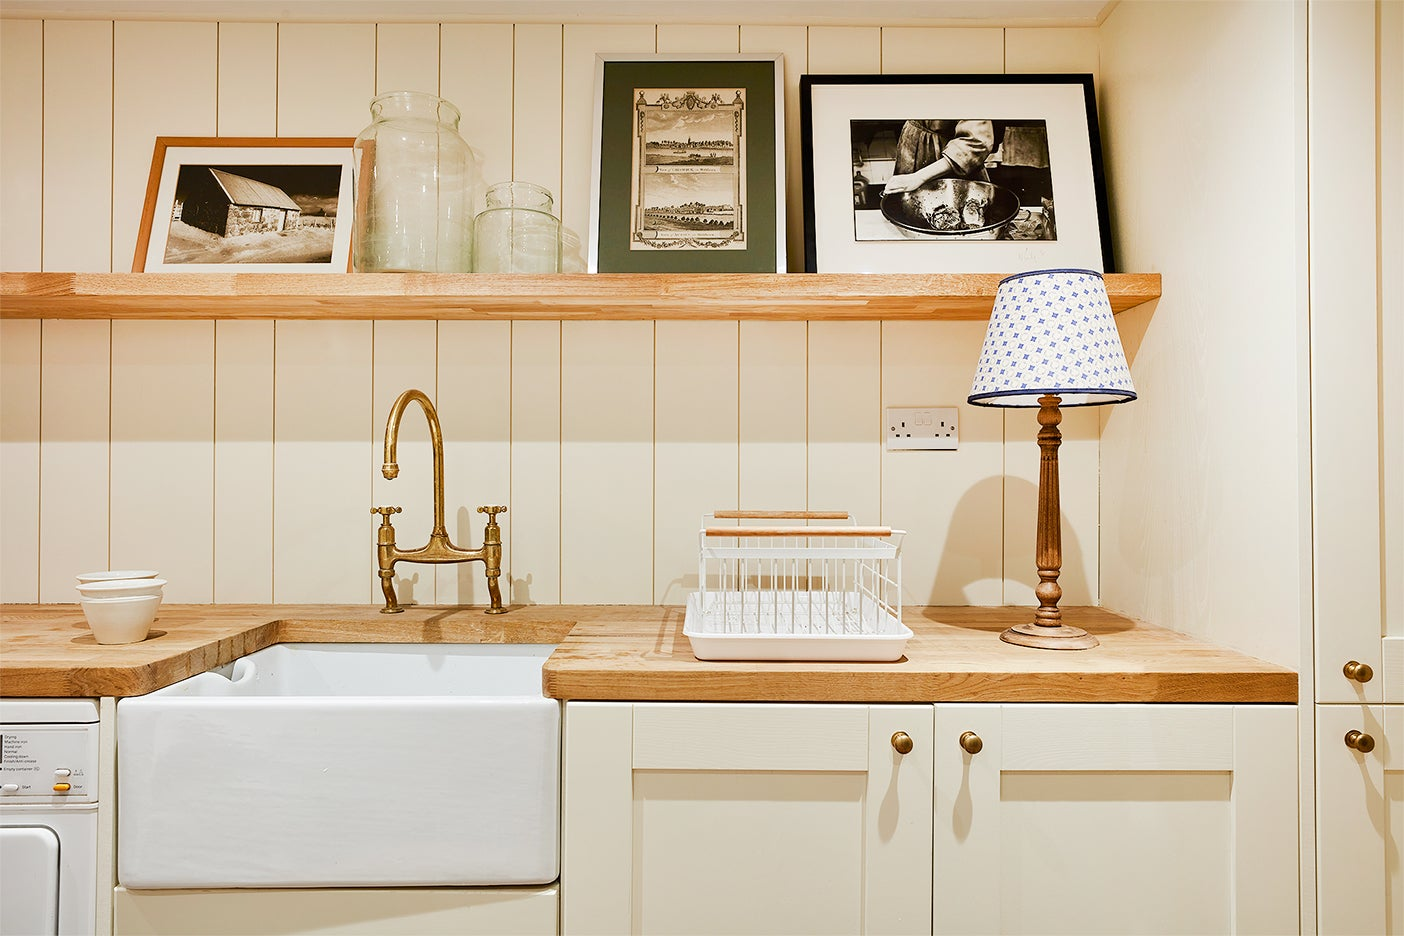 cream kitchenette with wood floating shelf